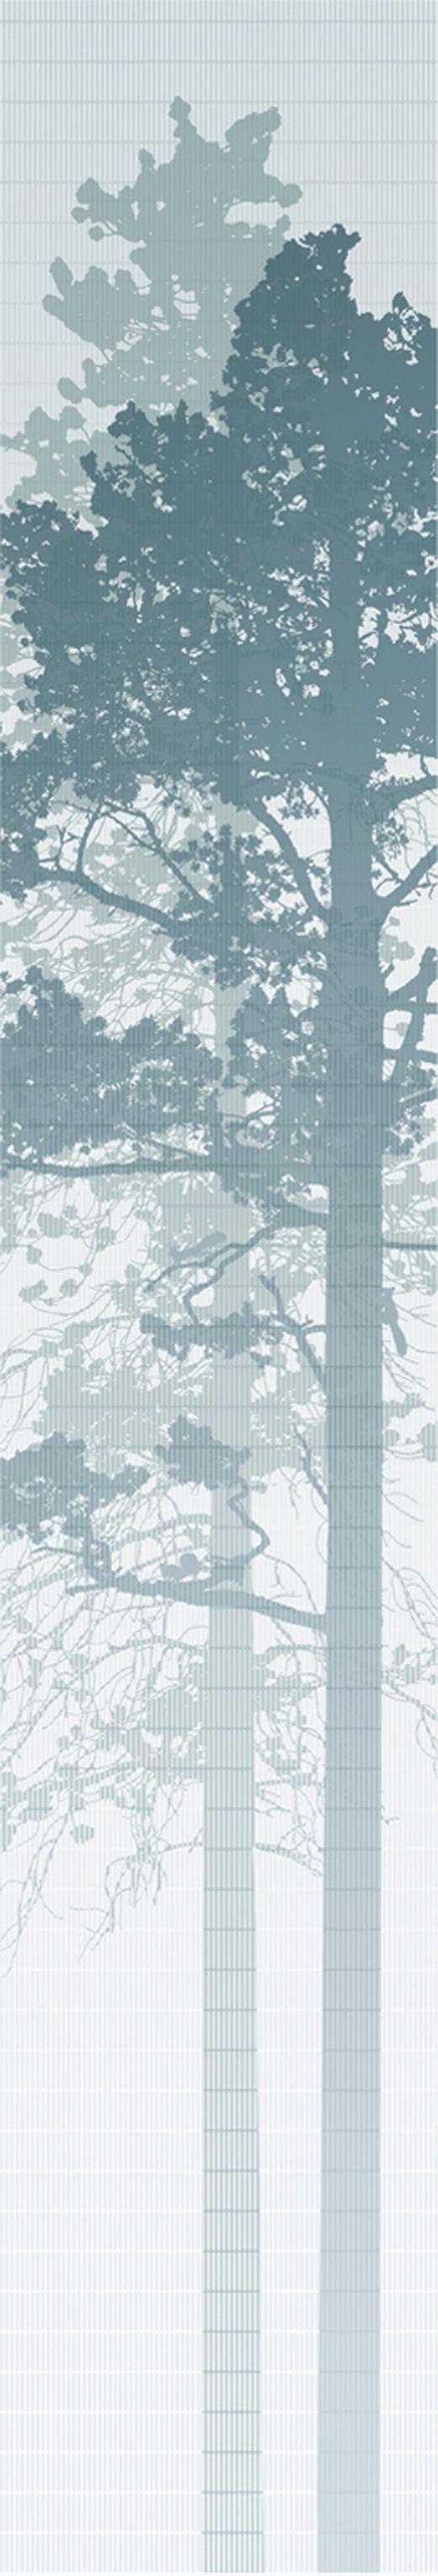 Tapeter & Veggdekor : Panel Piece - Woodland - Blågrønn